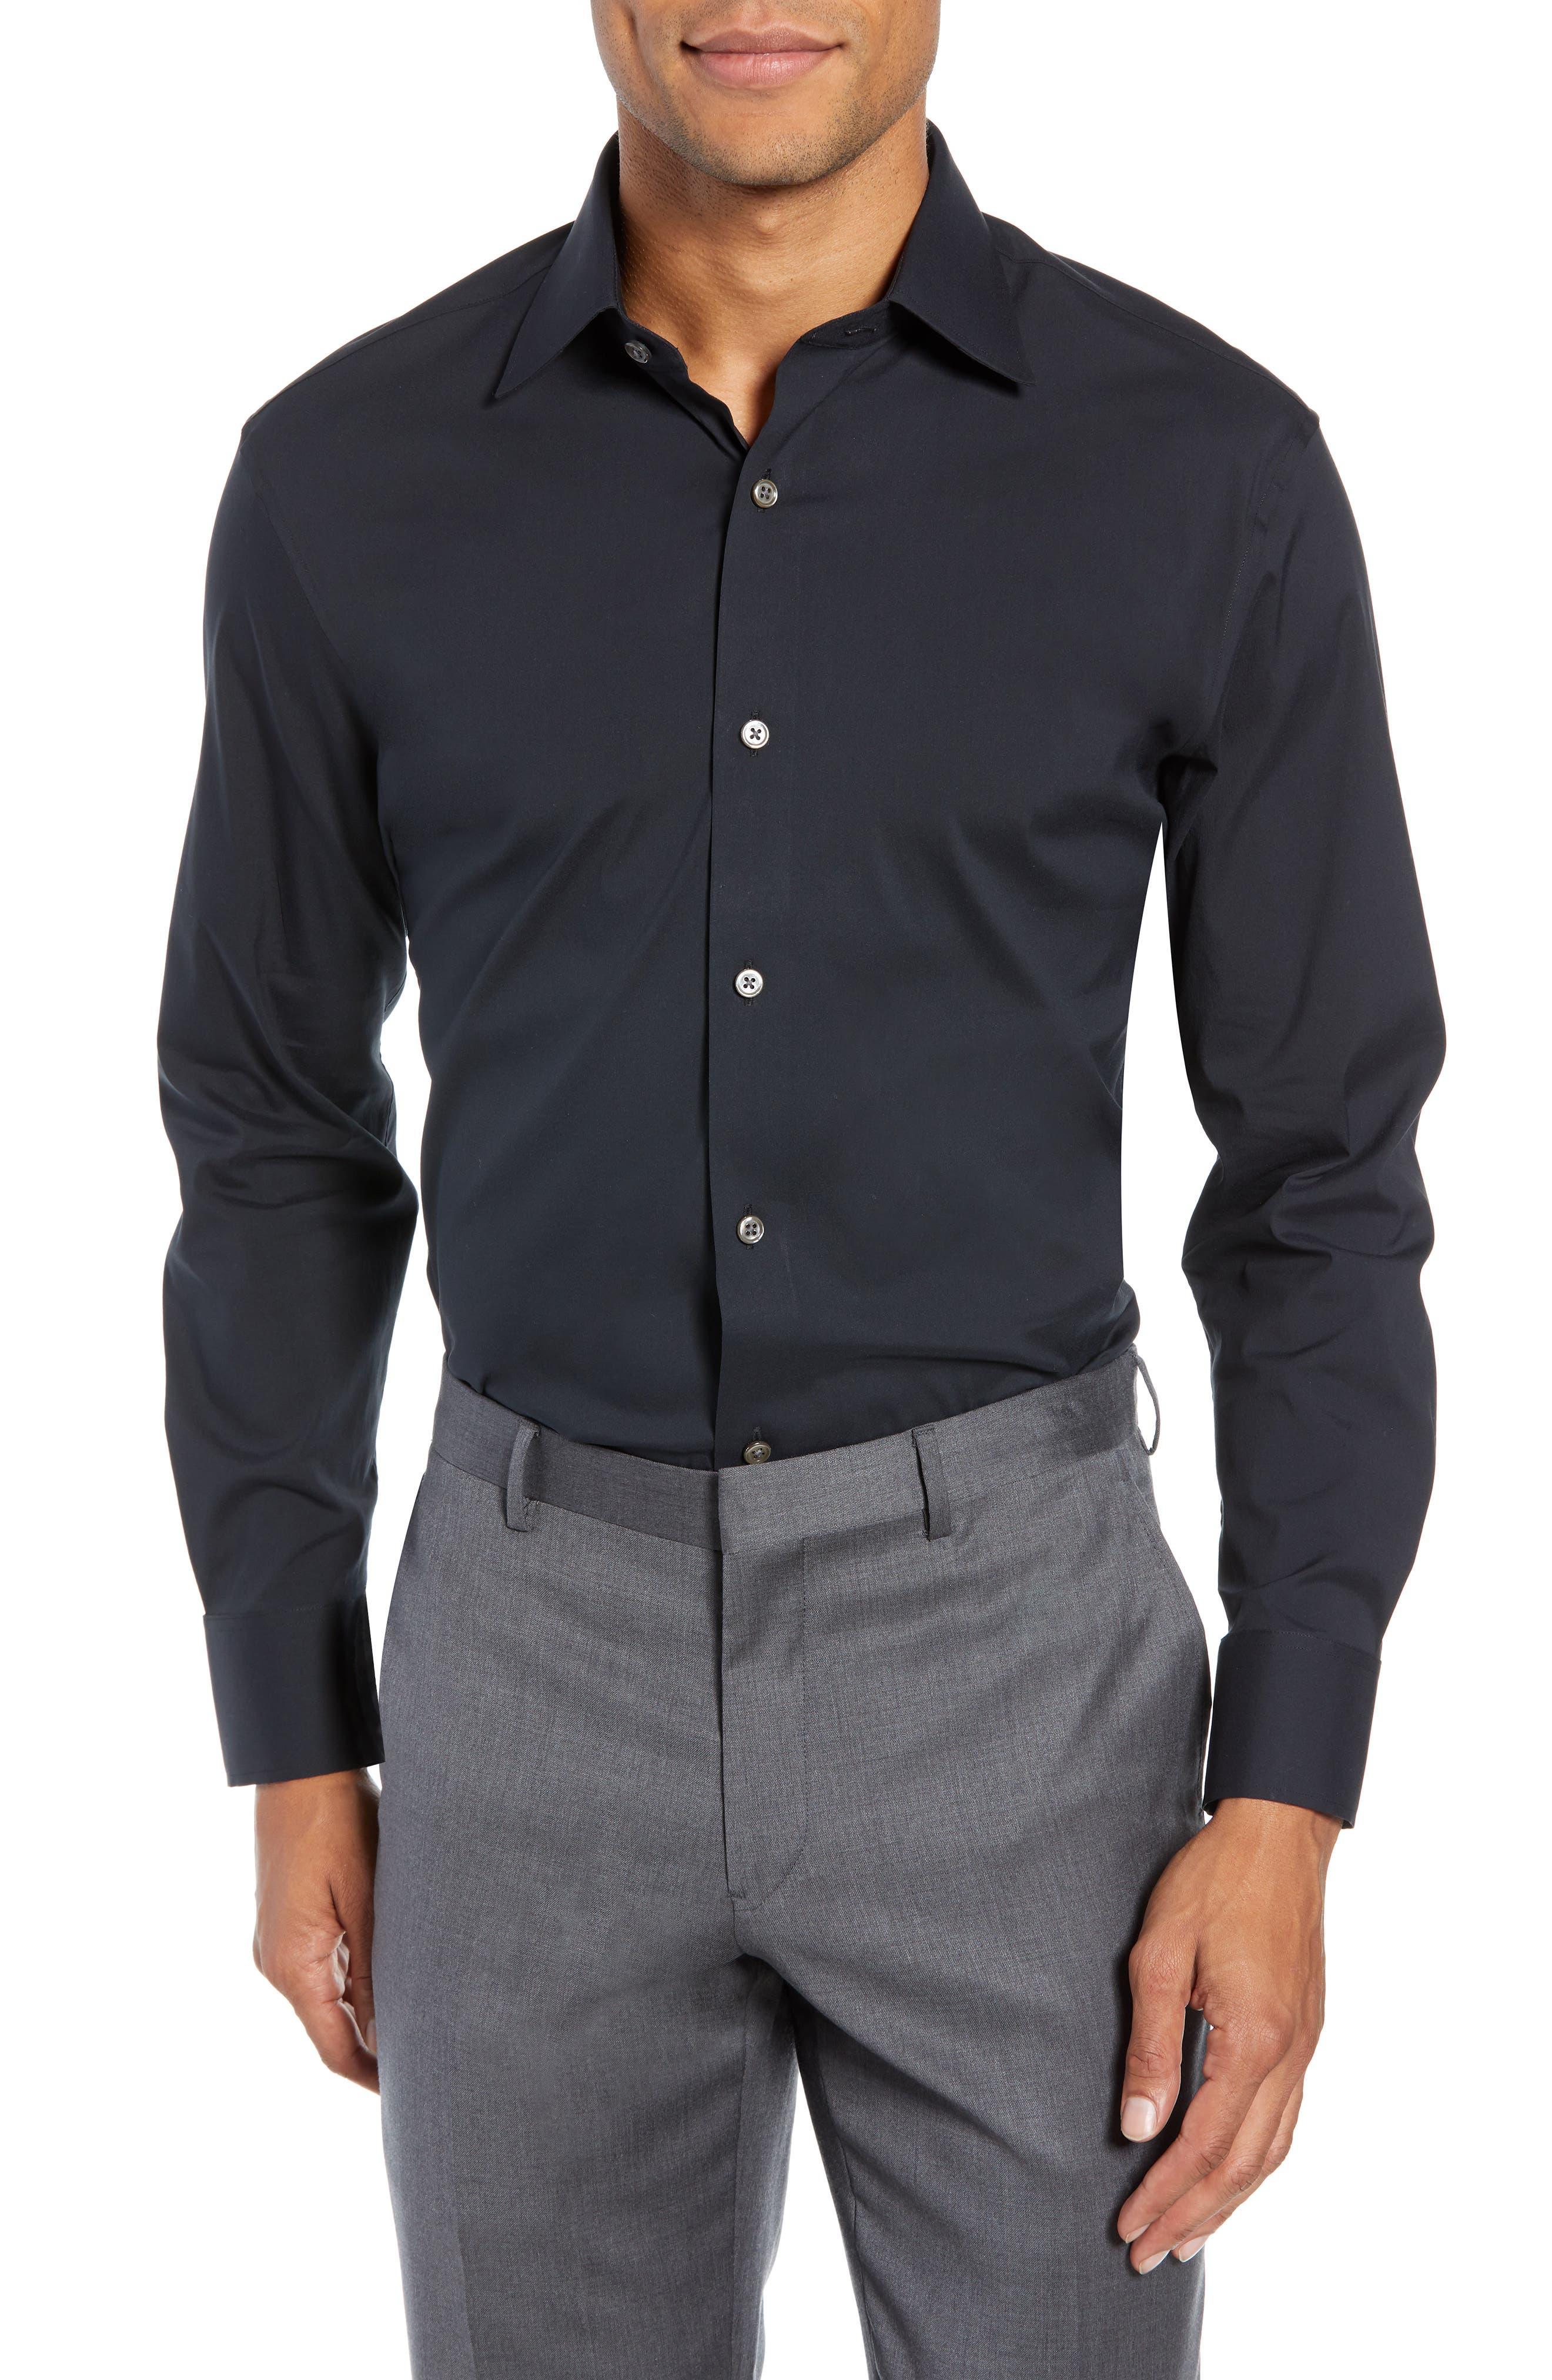 Jetsetter Slim Fit Solid Dress Shirt,                             Main thumbnail 1, color,                             BLACK